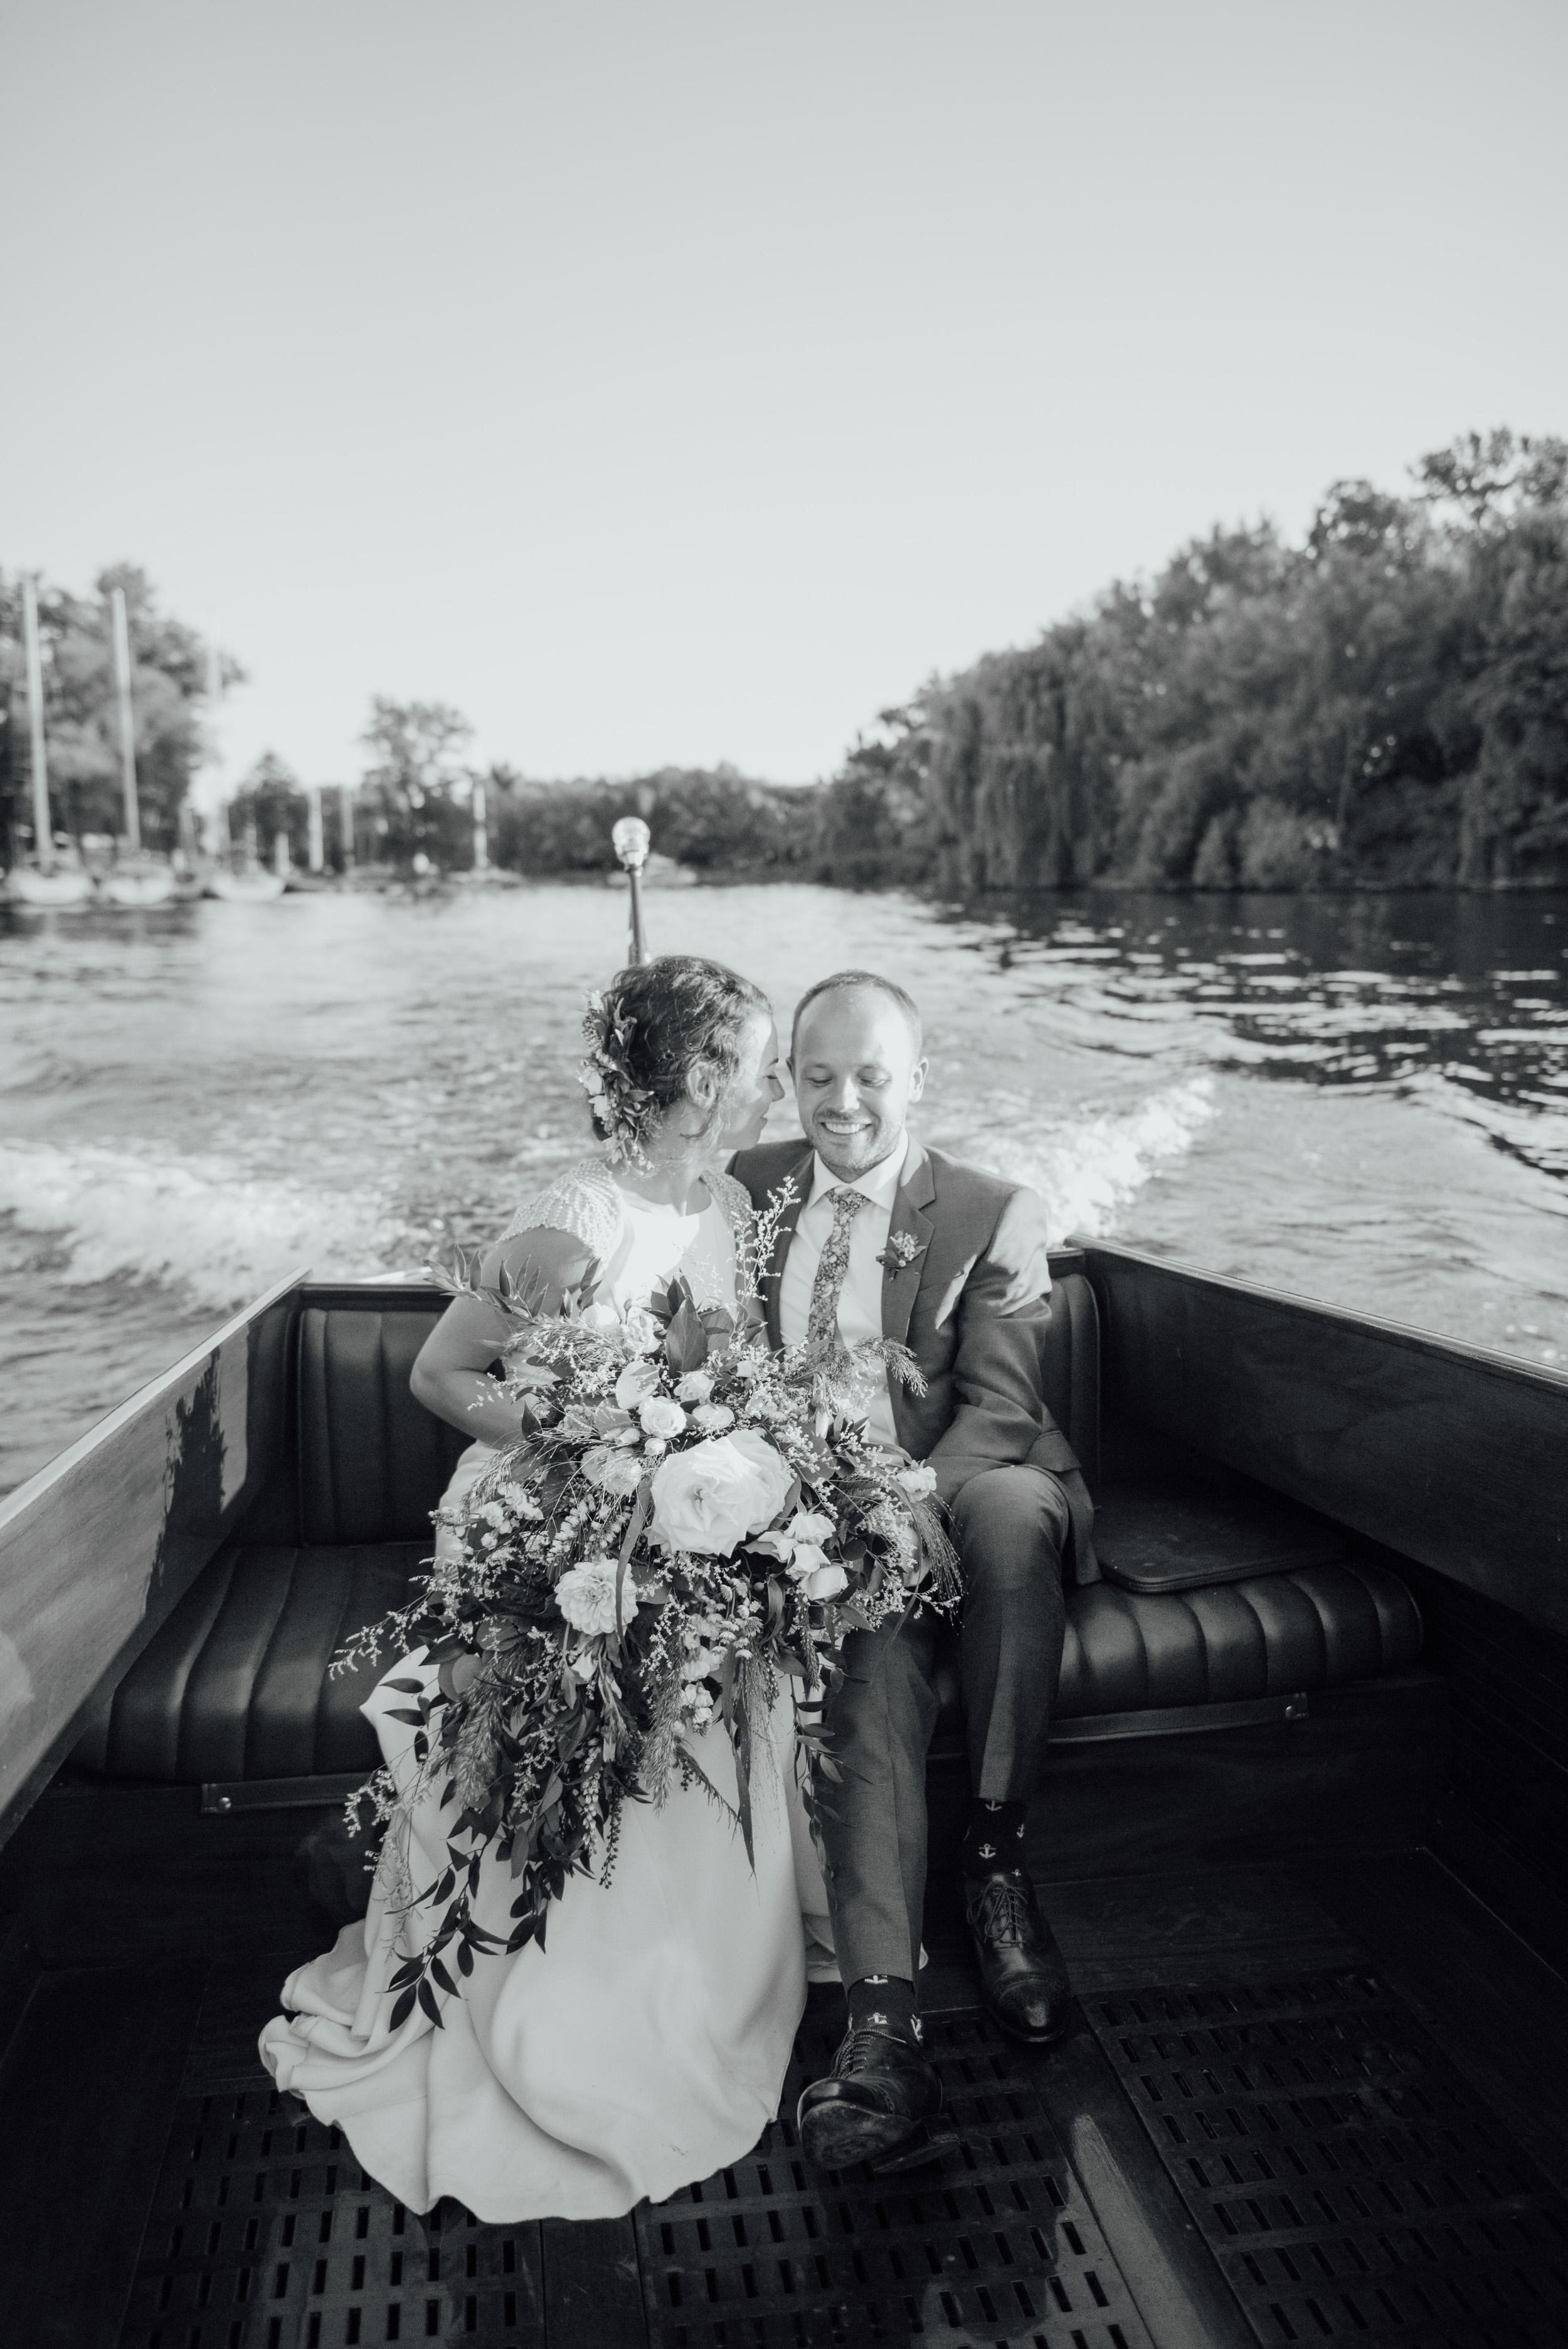 cleland-studios-wedding-photography-66.jpg